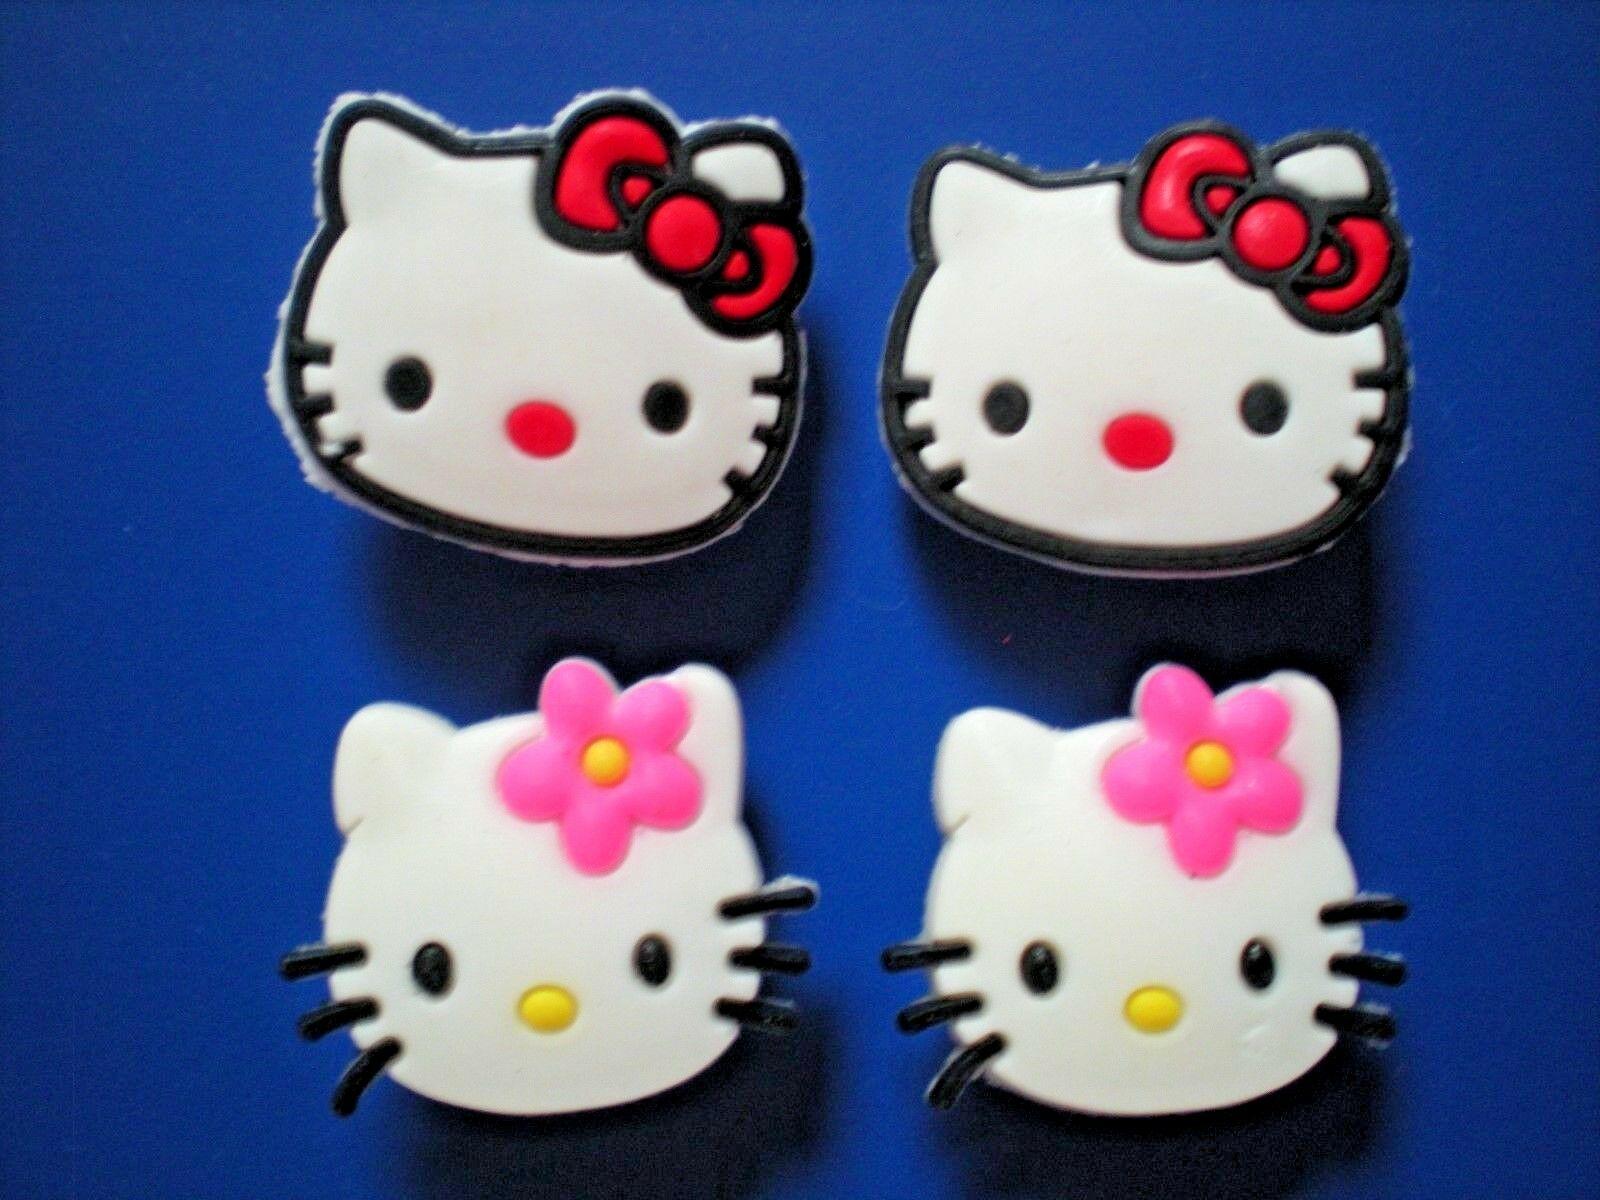 Clog Shoe Plug Button Charm Bracelet Accessorie 4 Kitty Cat Crystal